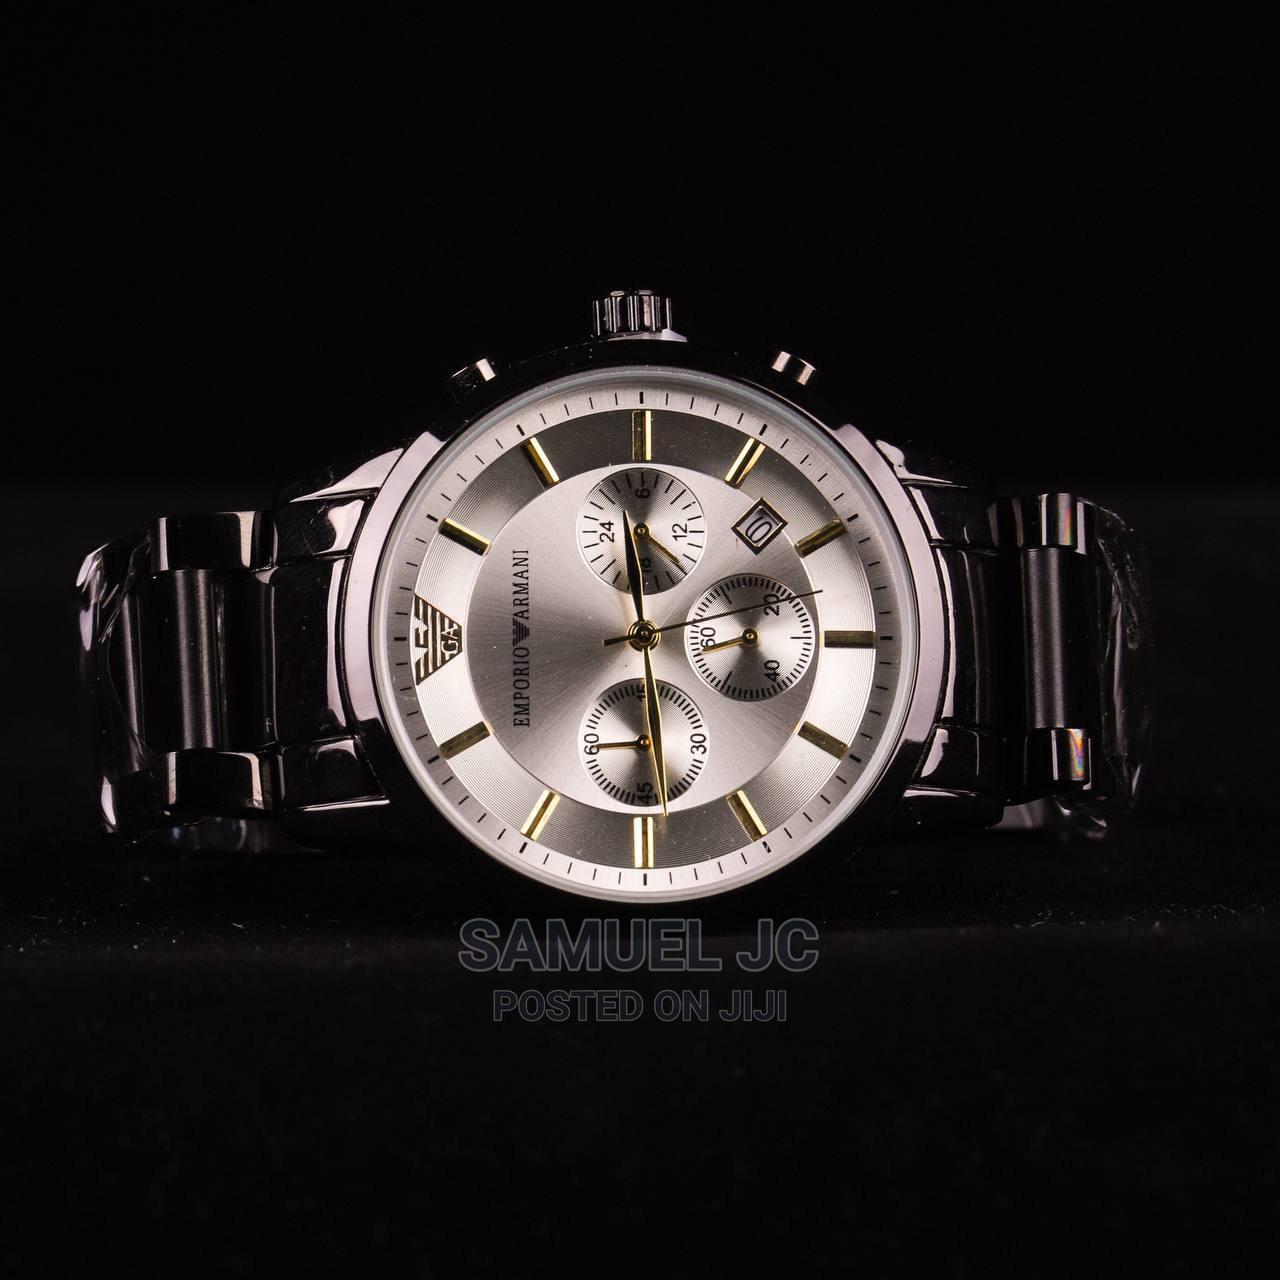 Emporio Armani Watches | Watches for sale in Bole, Addis Ababa, Ethiopia